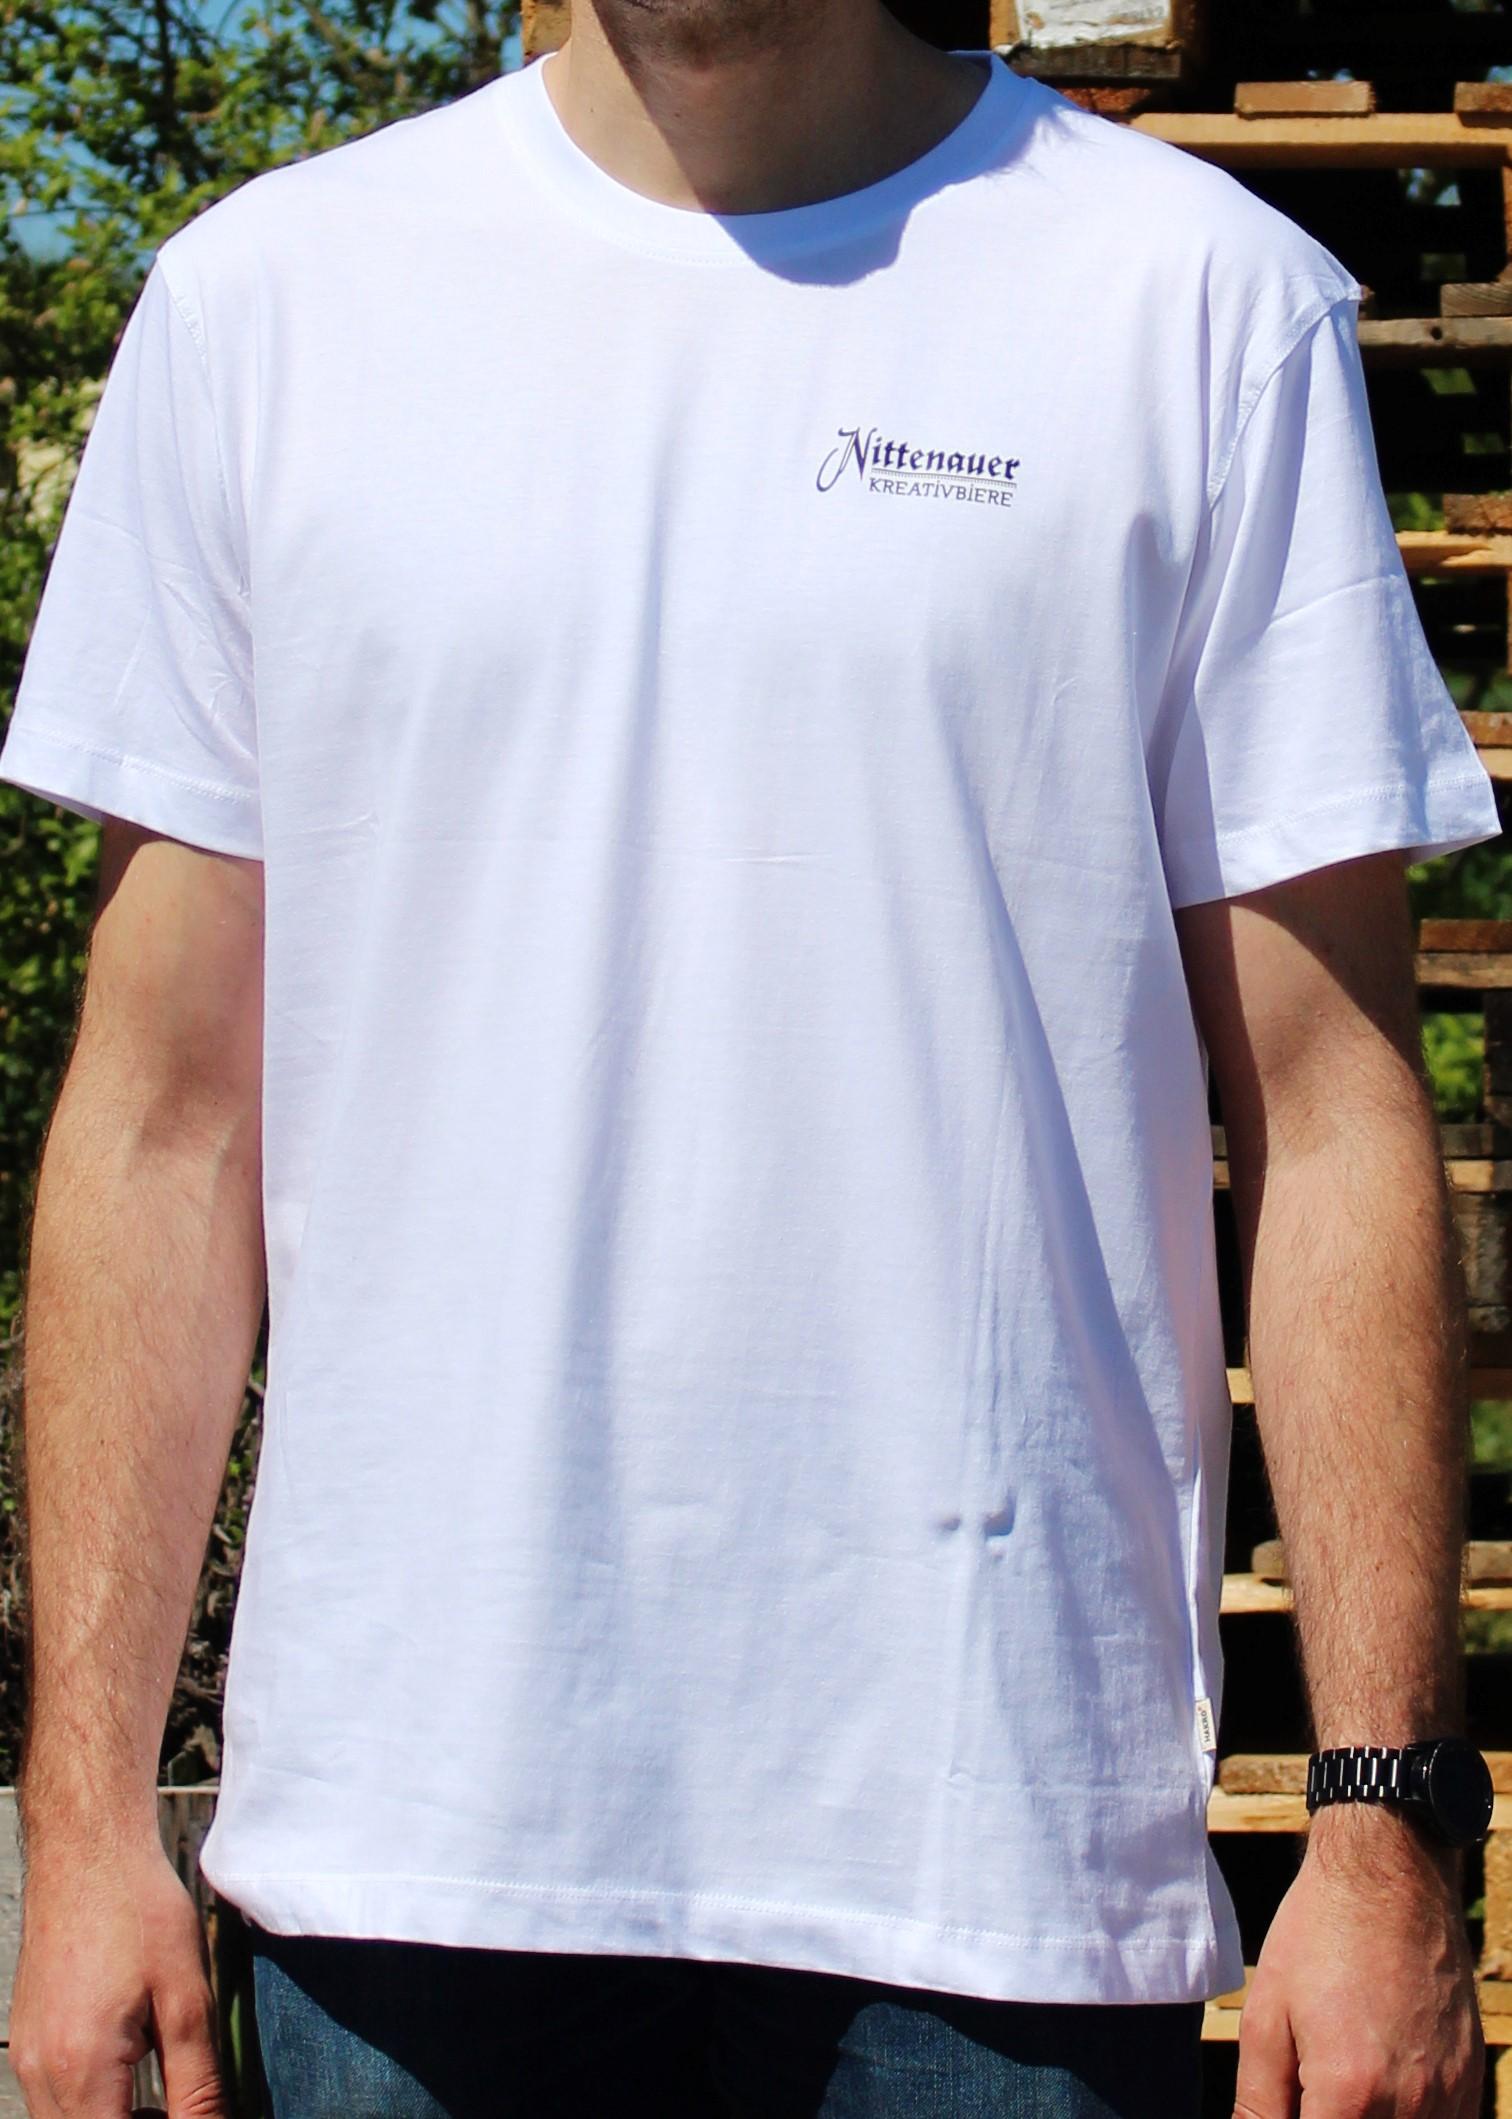 Nittenauer Kreativbiere T-Shirt - weiß